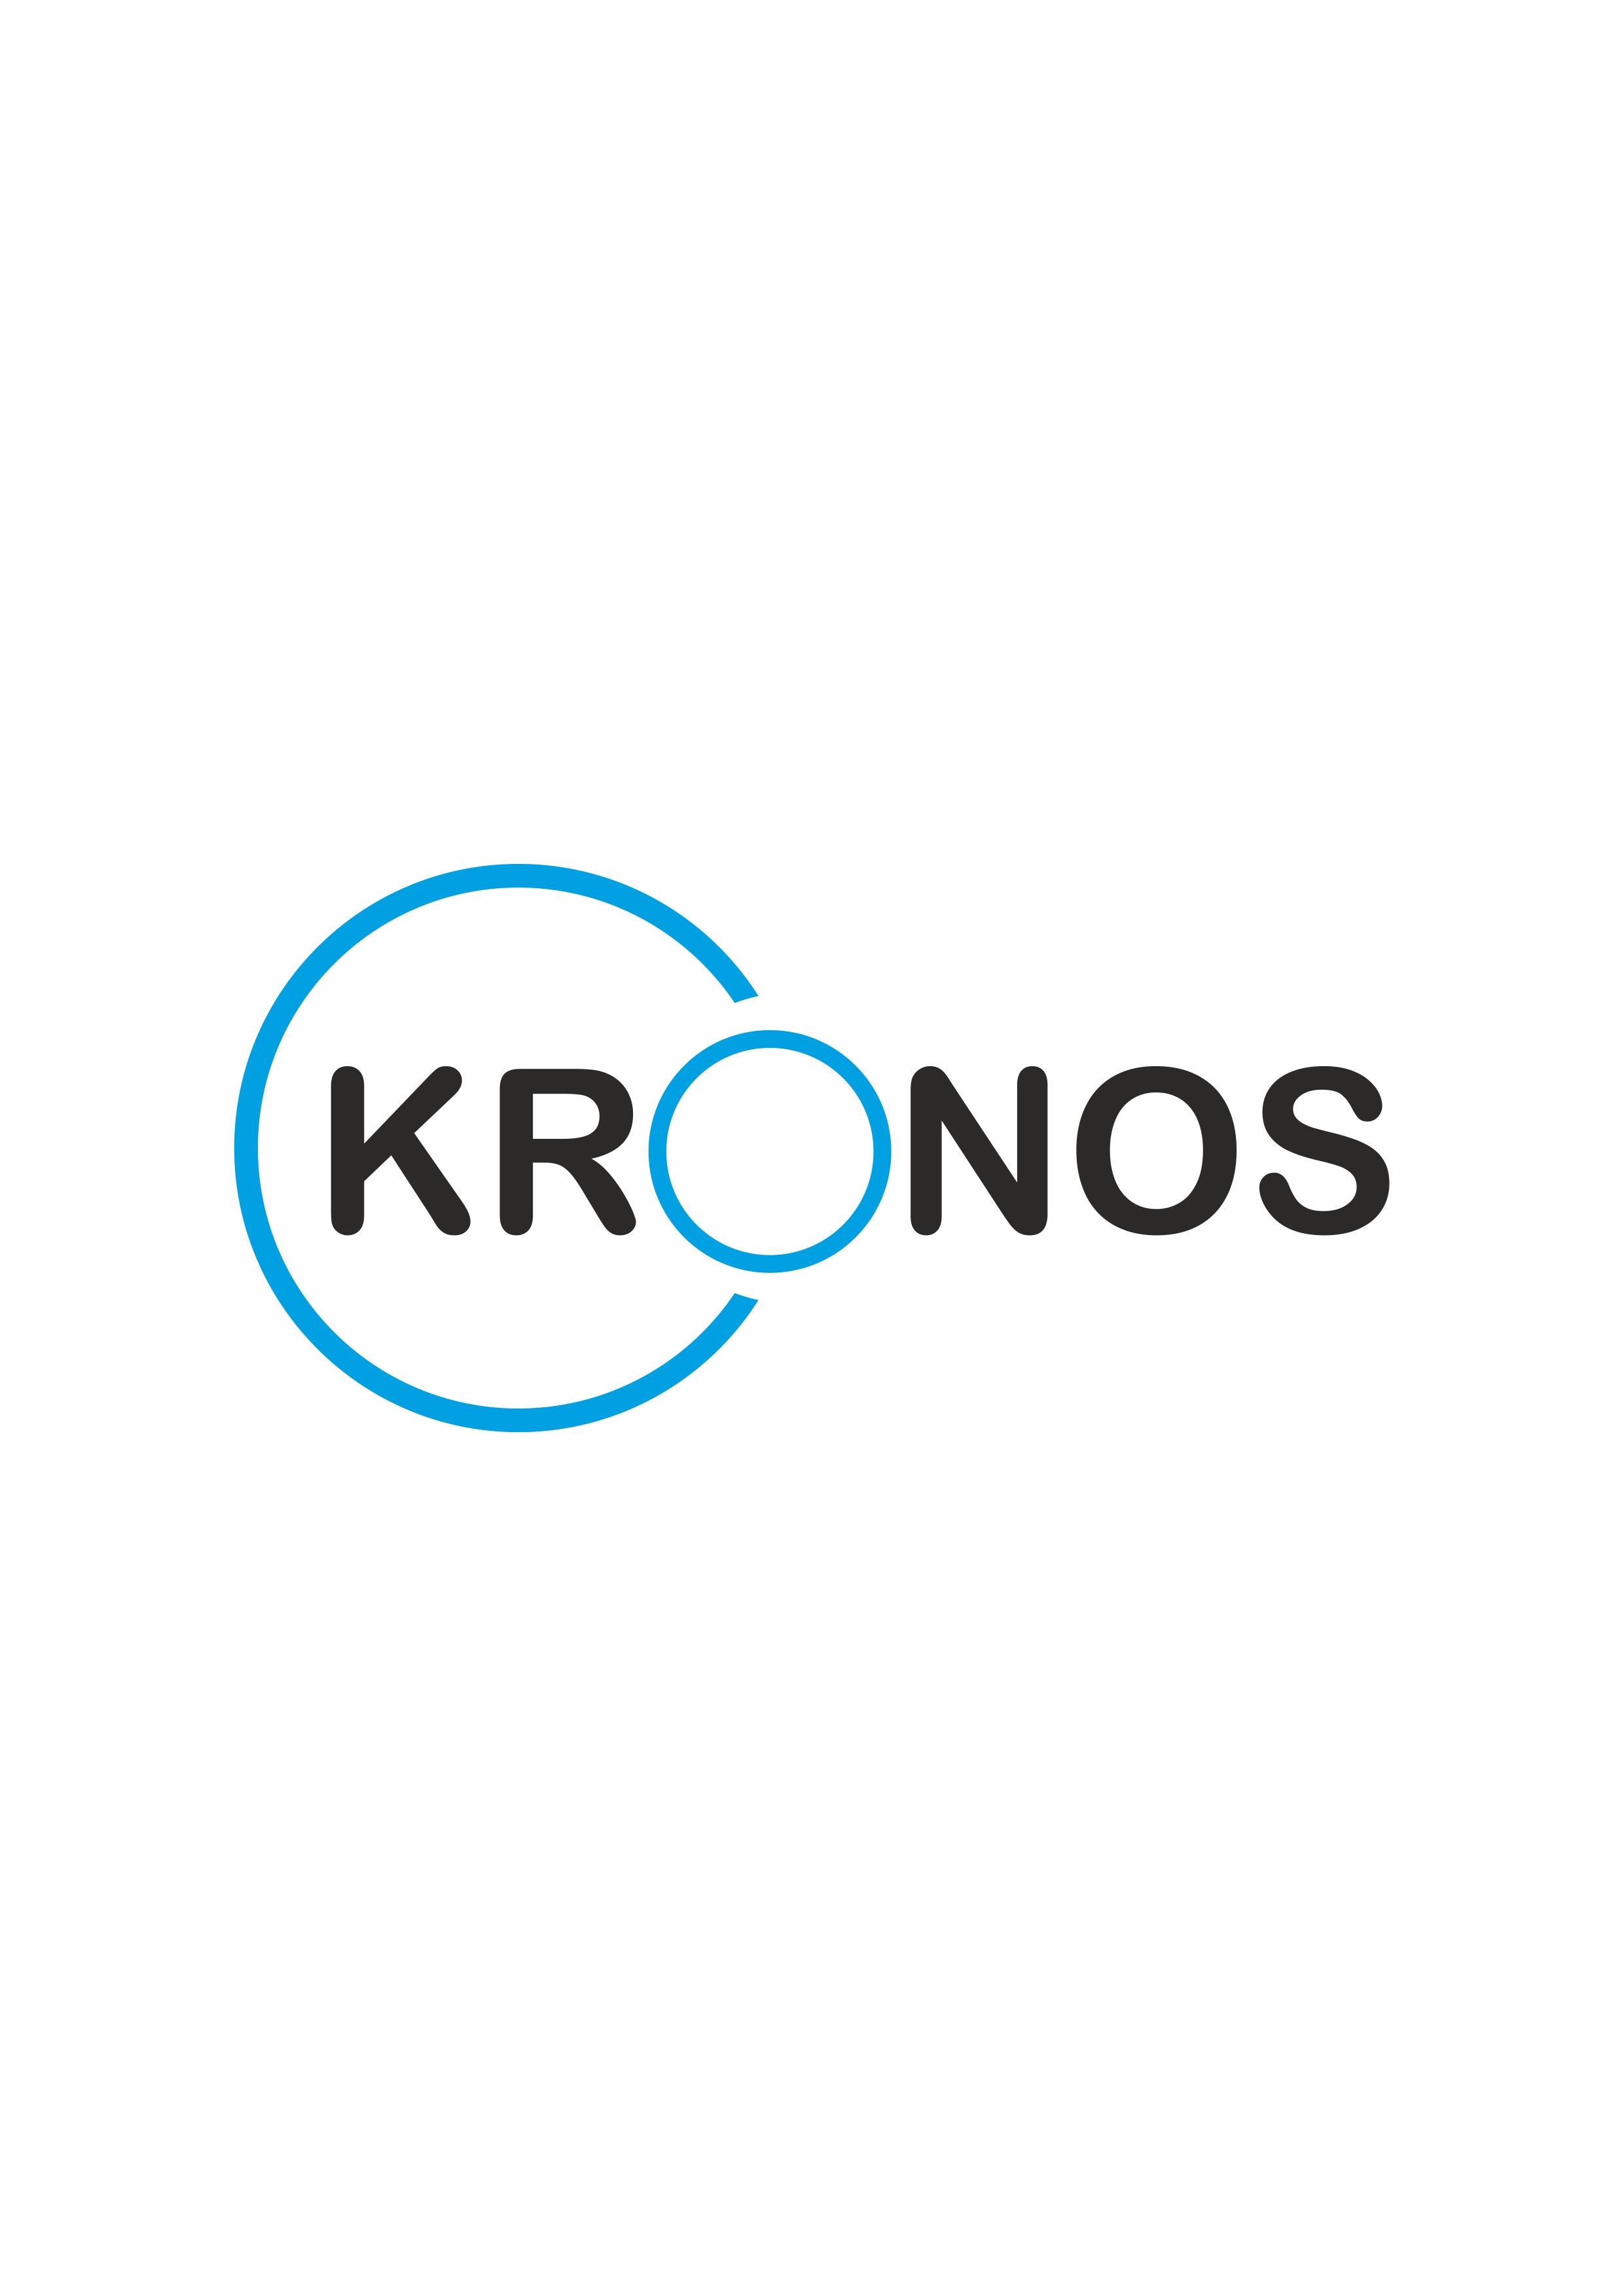 Разработать логотип KRONOS фото f_7295fb07ca4059d5.jpg